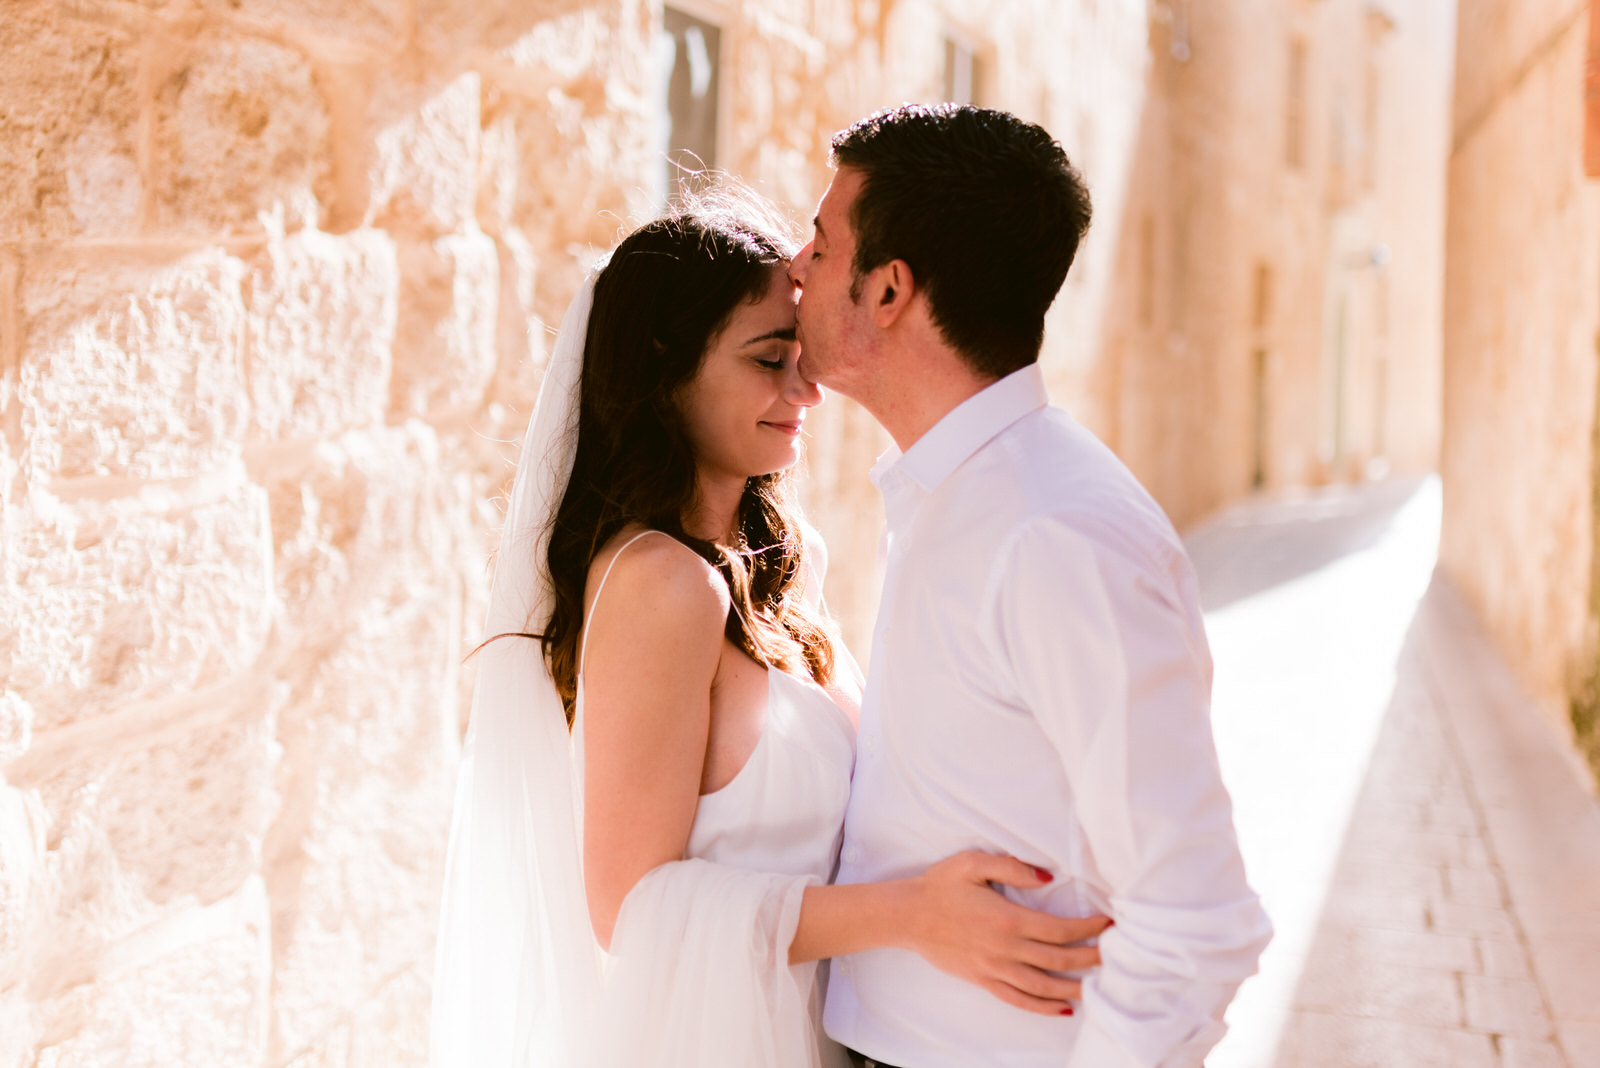 mdina wedding, malta wedding photography, malta elopement, golden bay malta wedding photos, wedding photographer malta, malta wedding venue, villa bologna wedding (43).jpg